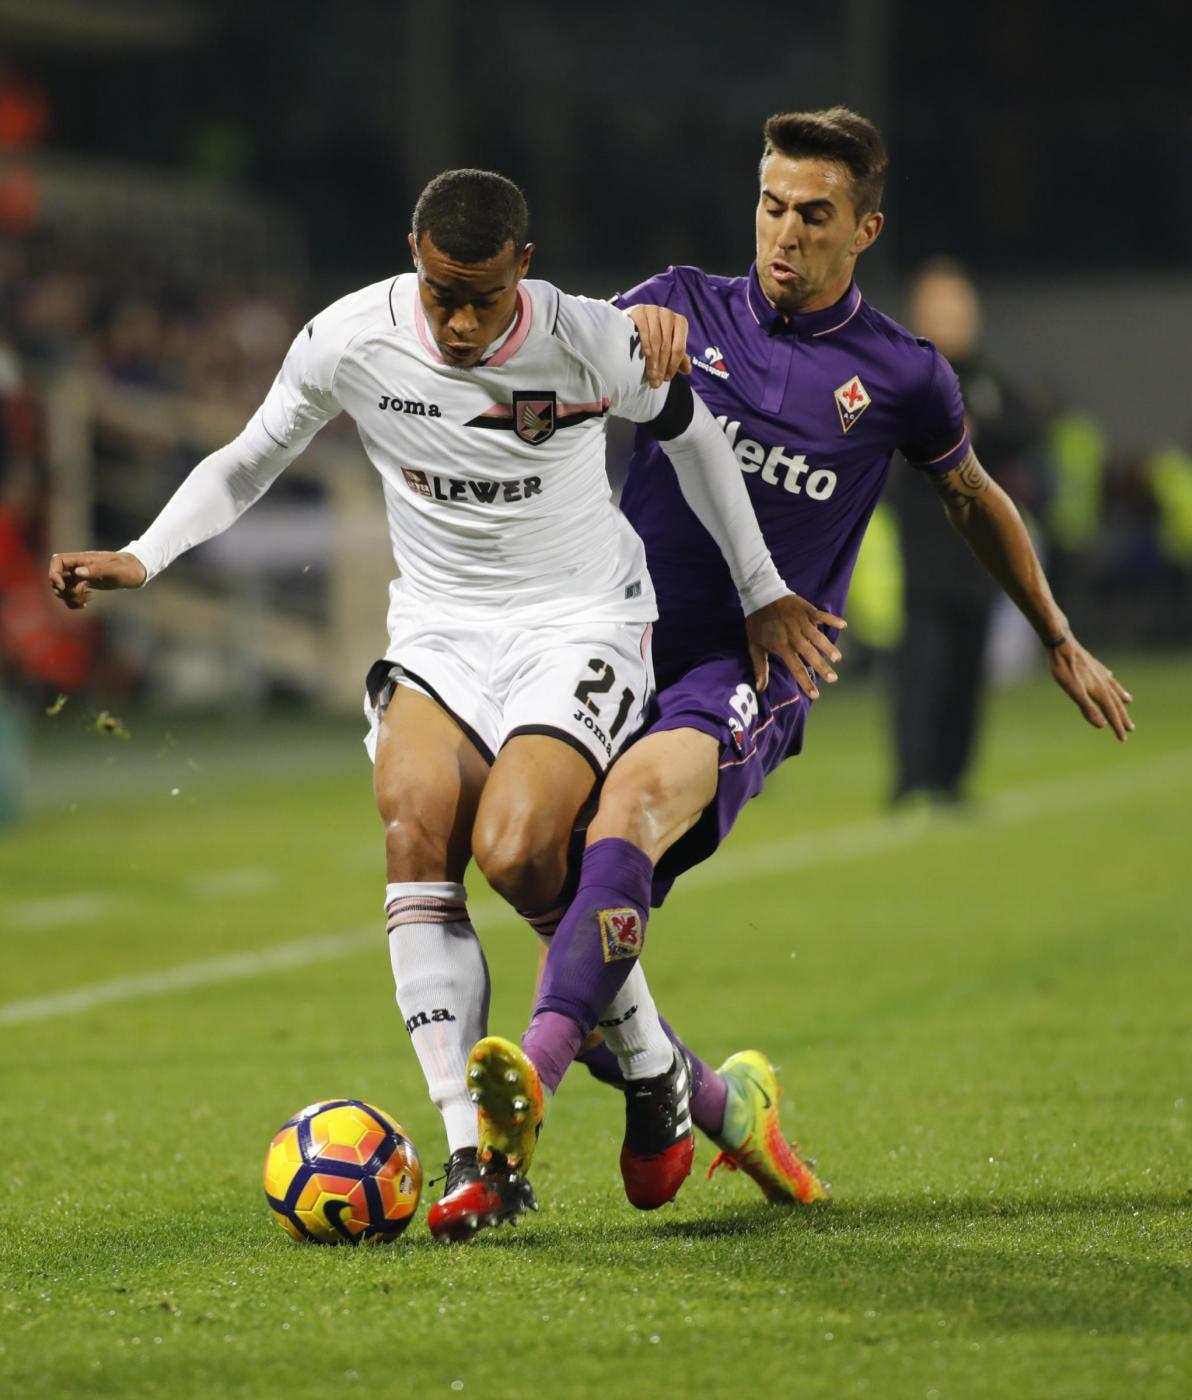 Gol Fiorentina-Palermo 2-1 Video Highlights e Sintesi (Serie A 2016-17)